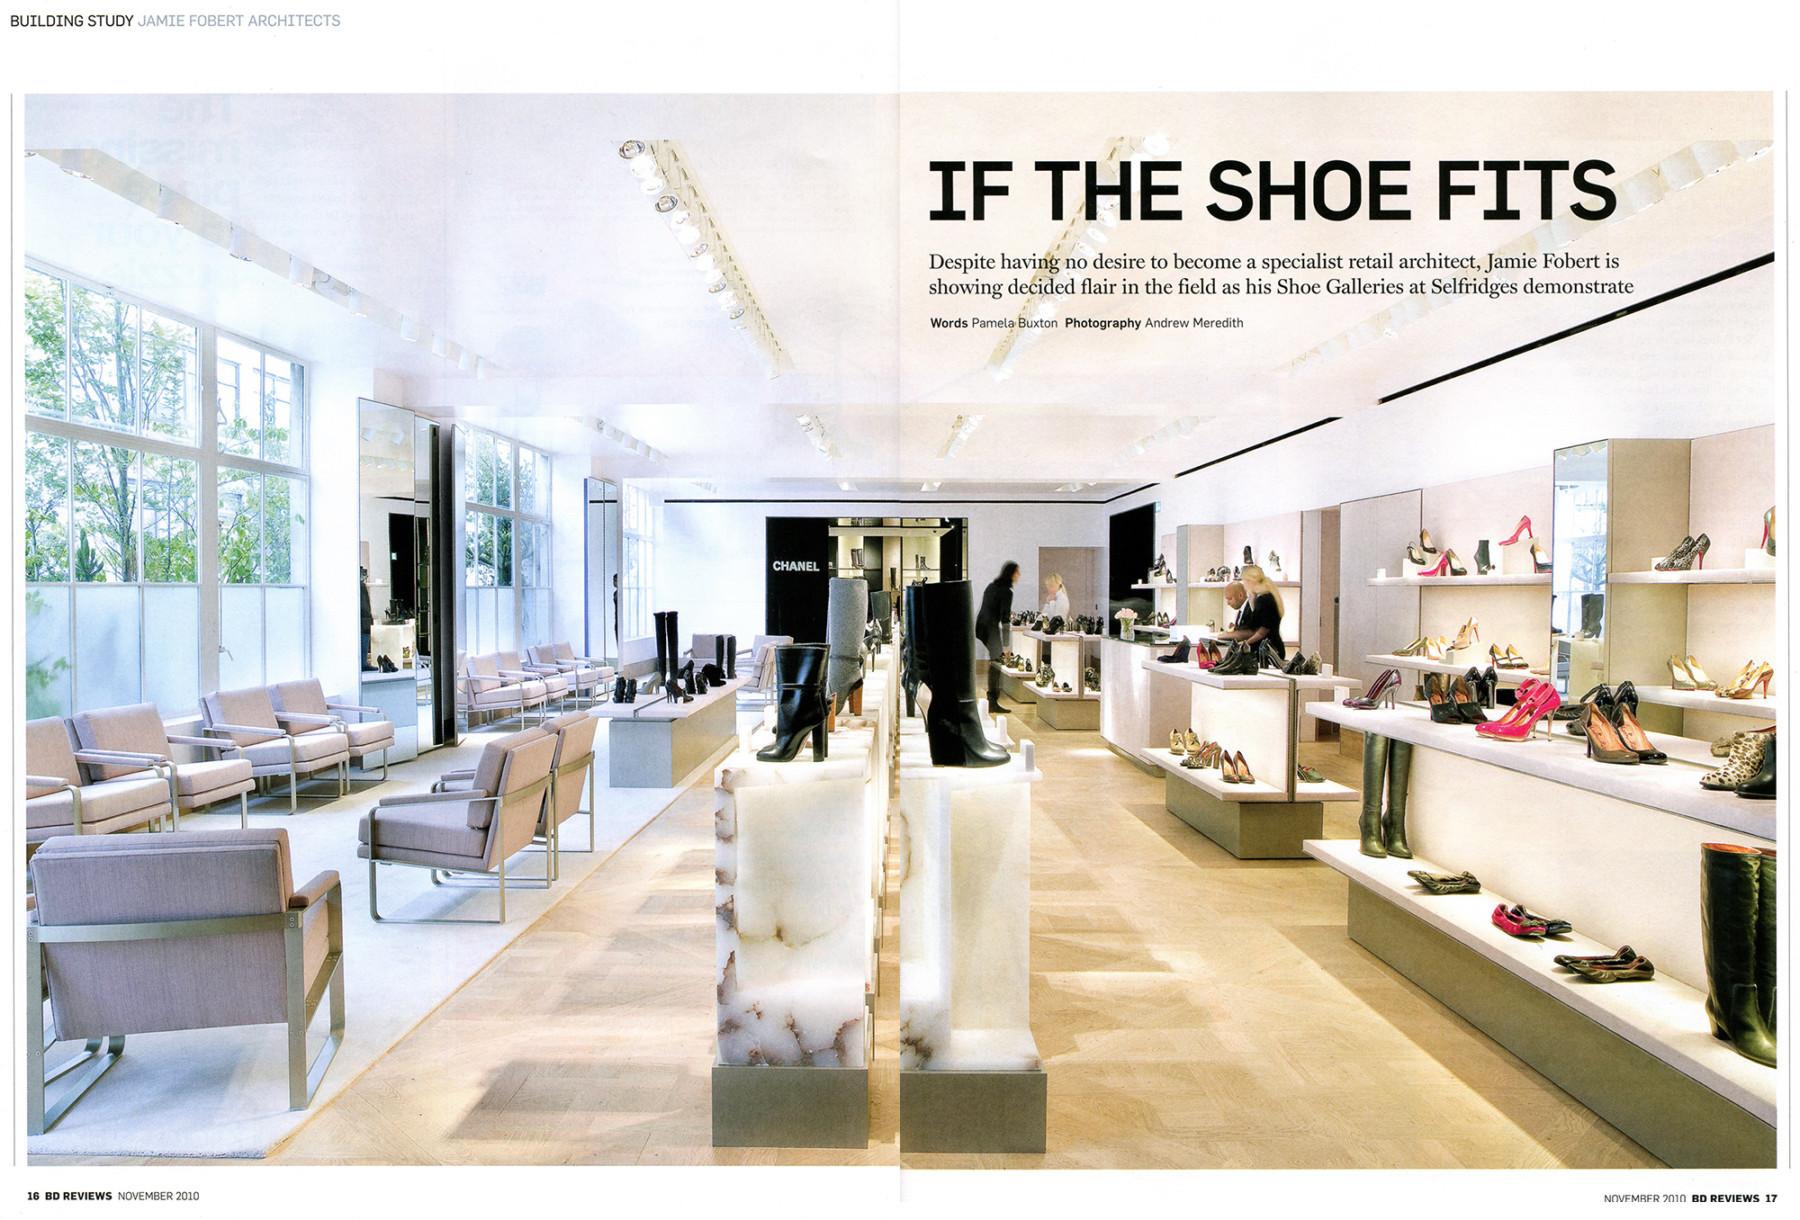 Jamie-Fobert-Architects-Selfridges-Shoes-Article-Press-BD 1